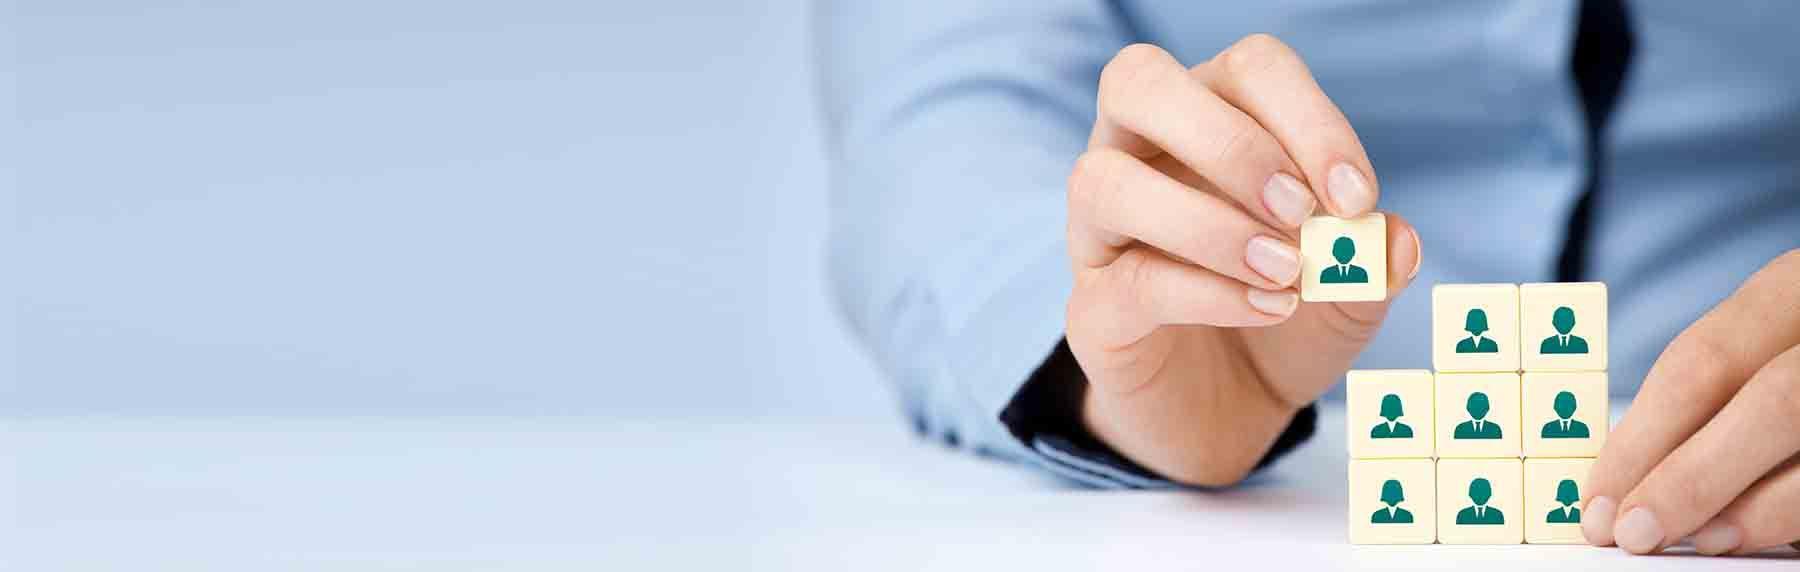 Careers magazine freshers job openings professional